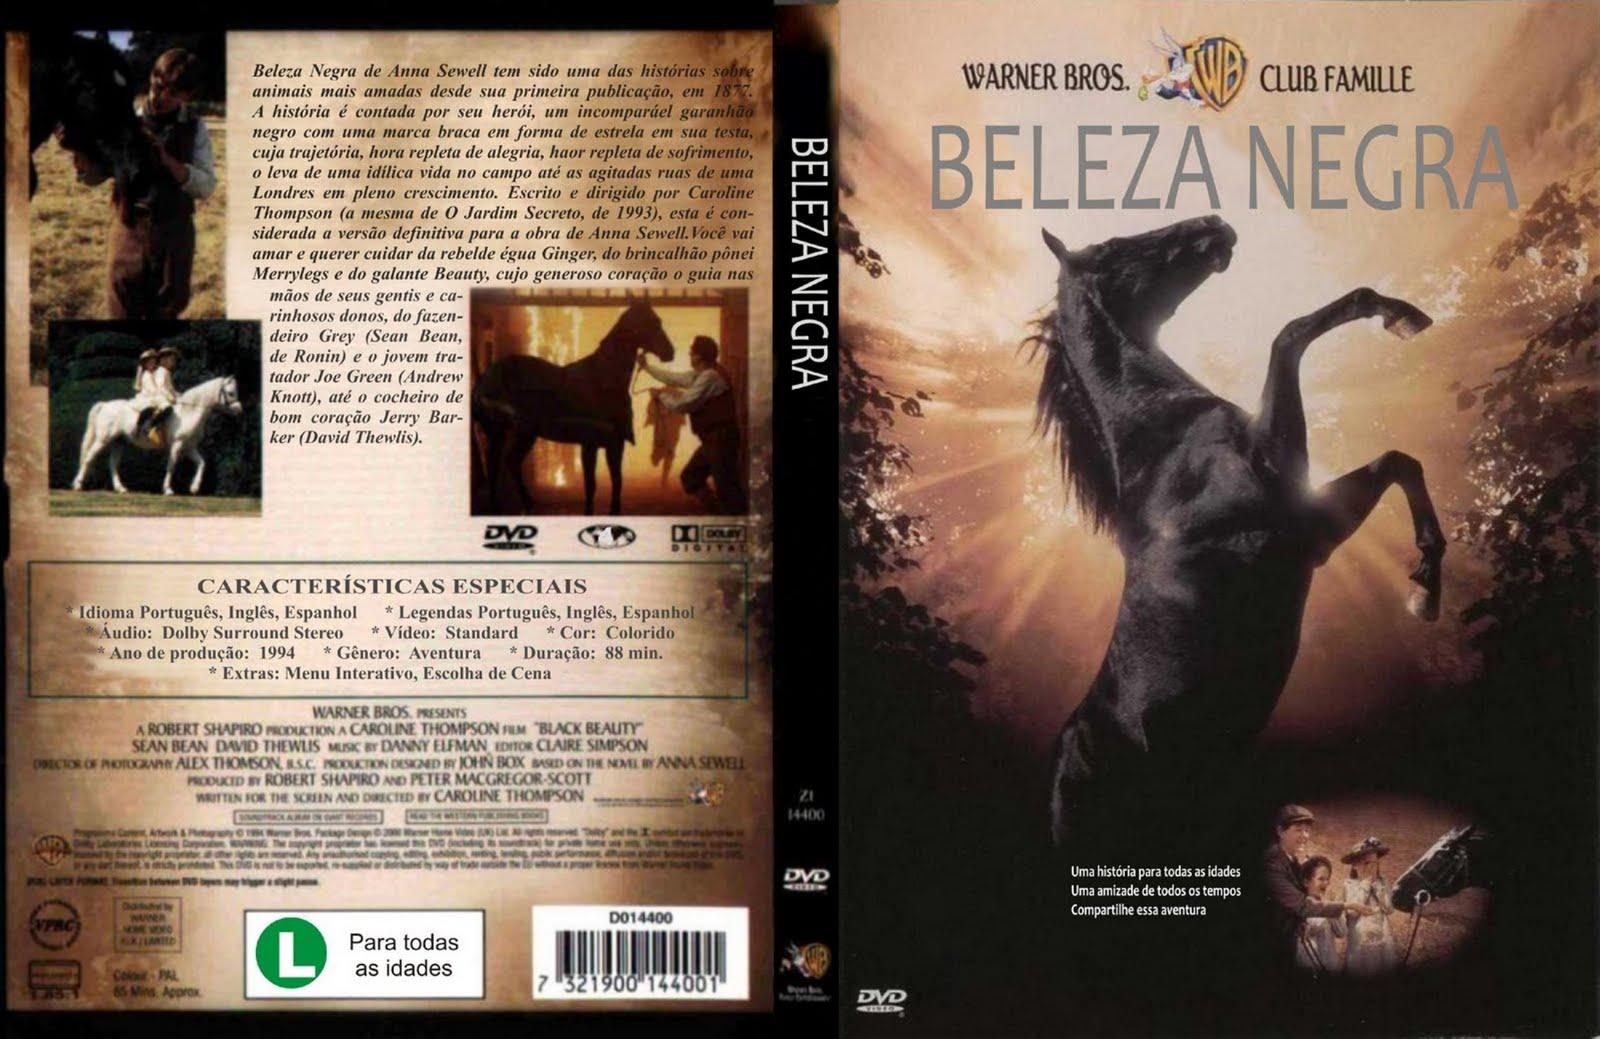 http://4.bp.blogspot.com/_WHxjd2HO-SQ/S-meNi02lTI/AAAAAAAAAkE/pdWhgjFv3Rg/s1600/Beleza+Negra.jpg